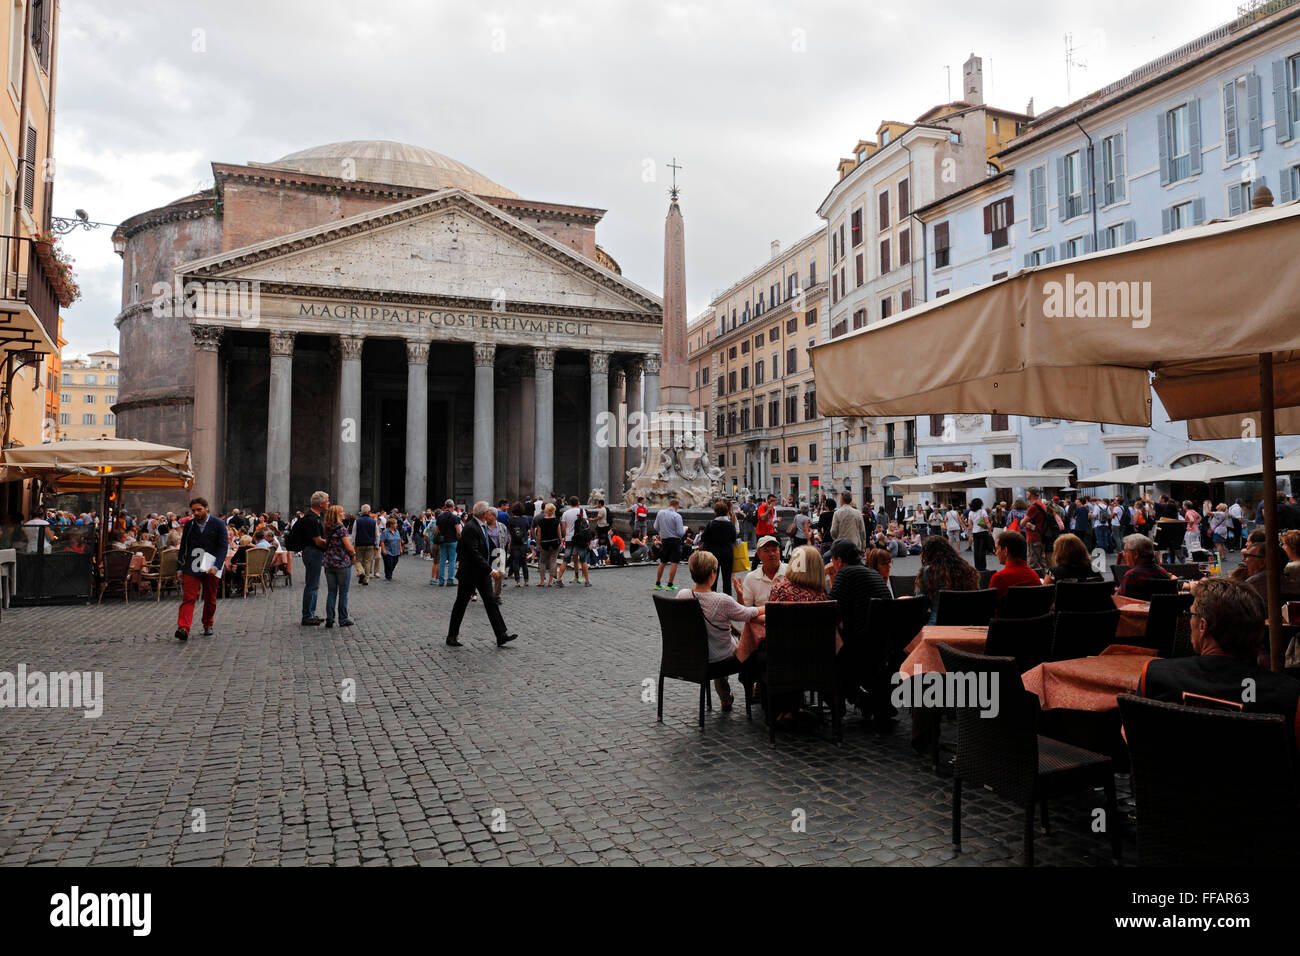 The Pantheon and the Fontana del Pantheon on Piazza della Rotonda, Rome, Italy Stock Photo